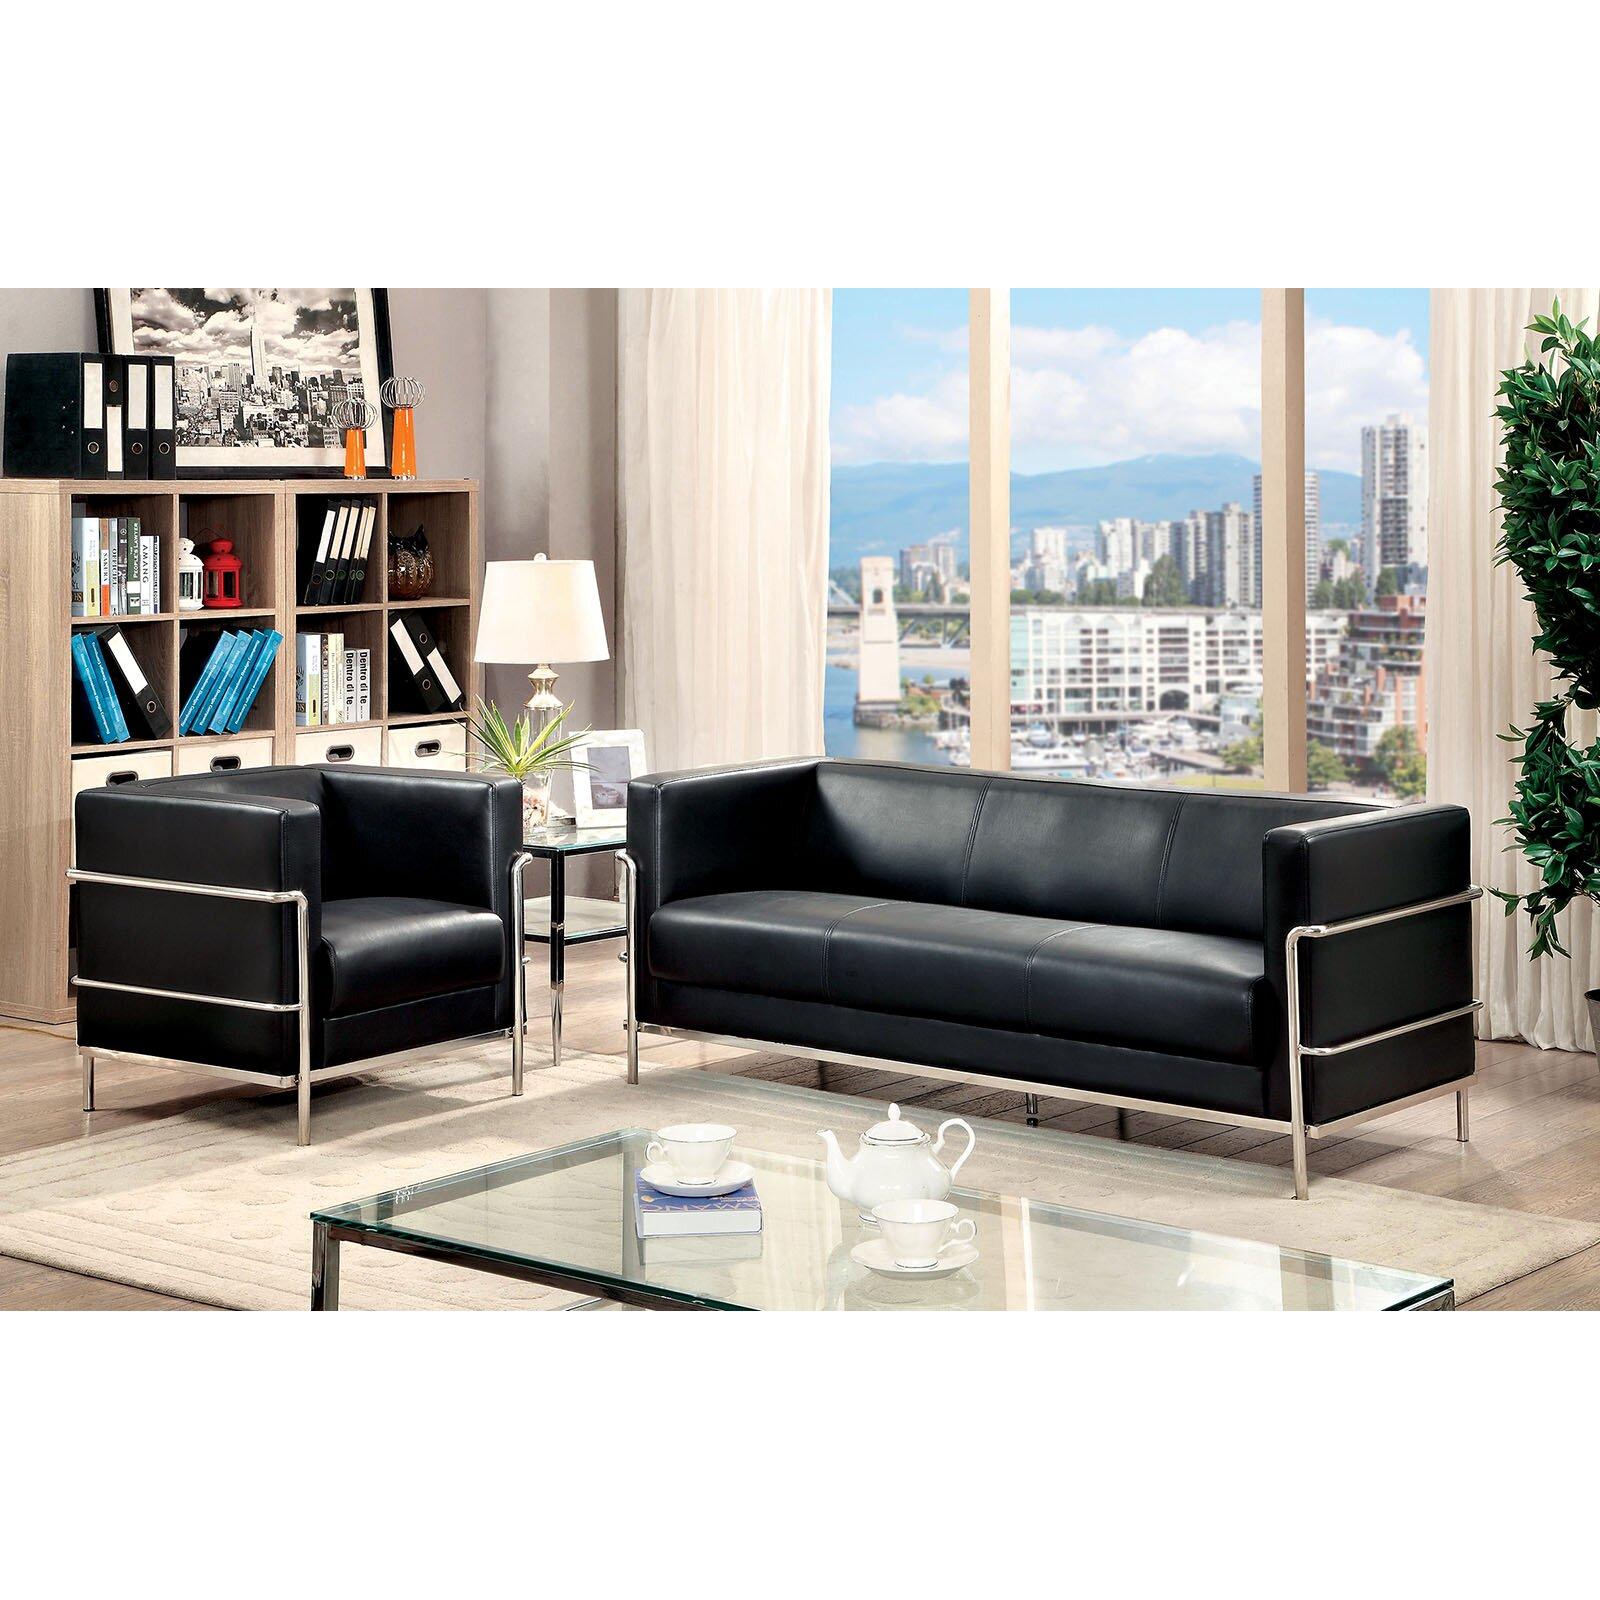 A j homes studio leifur 2 piece living room set wayfair for 2 piece living room set